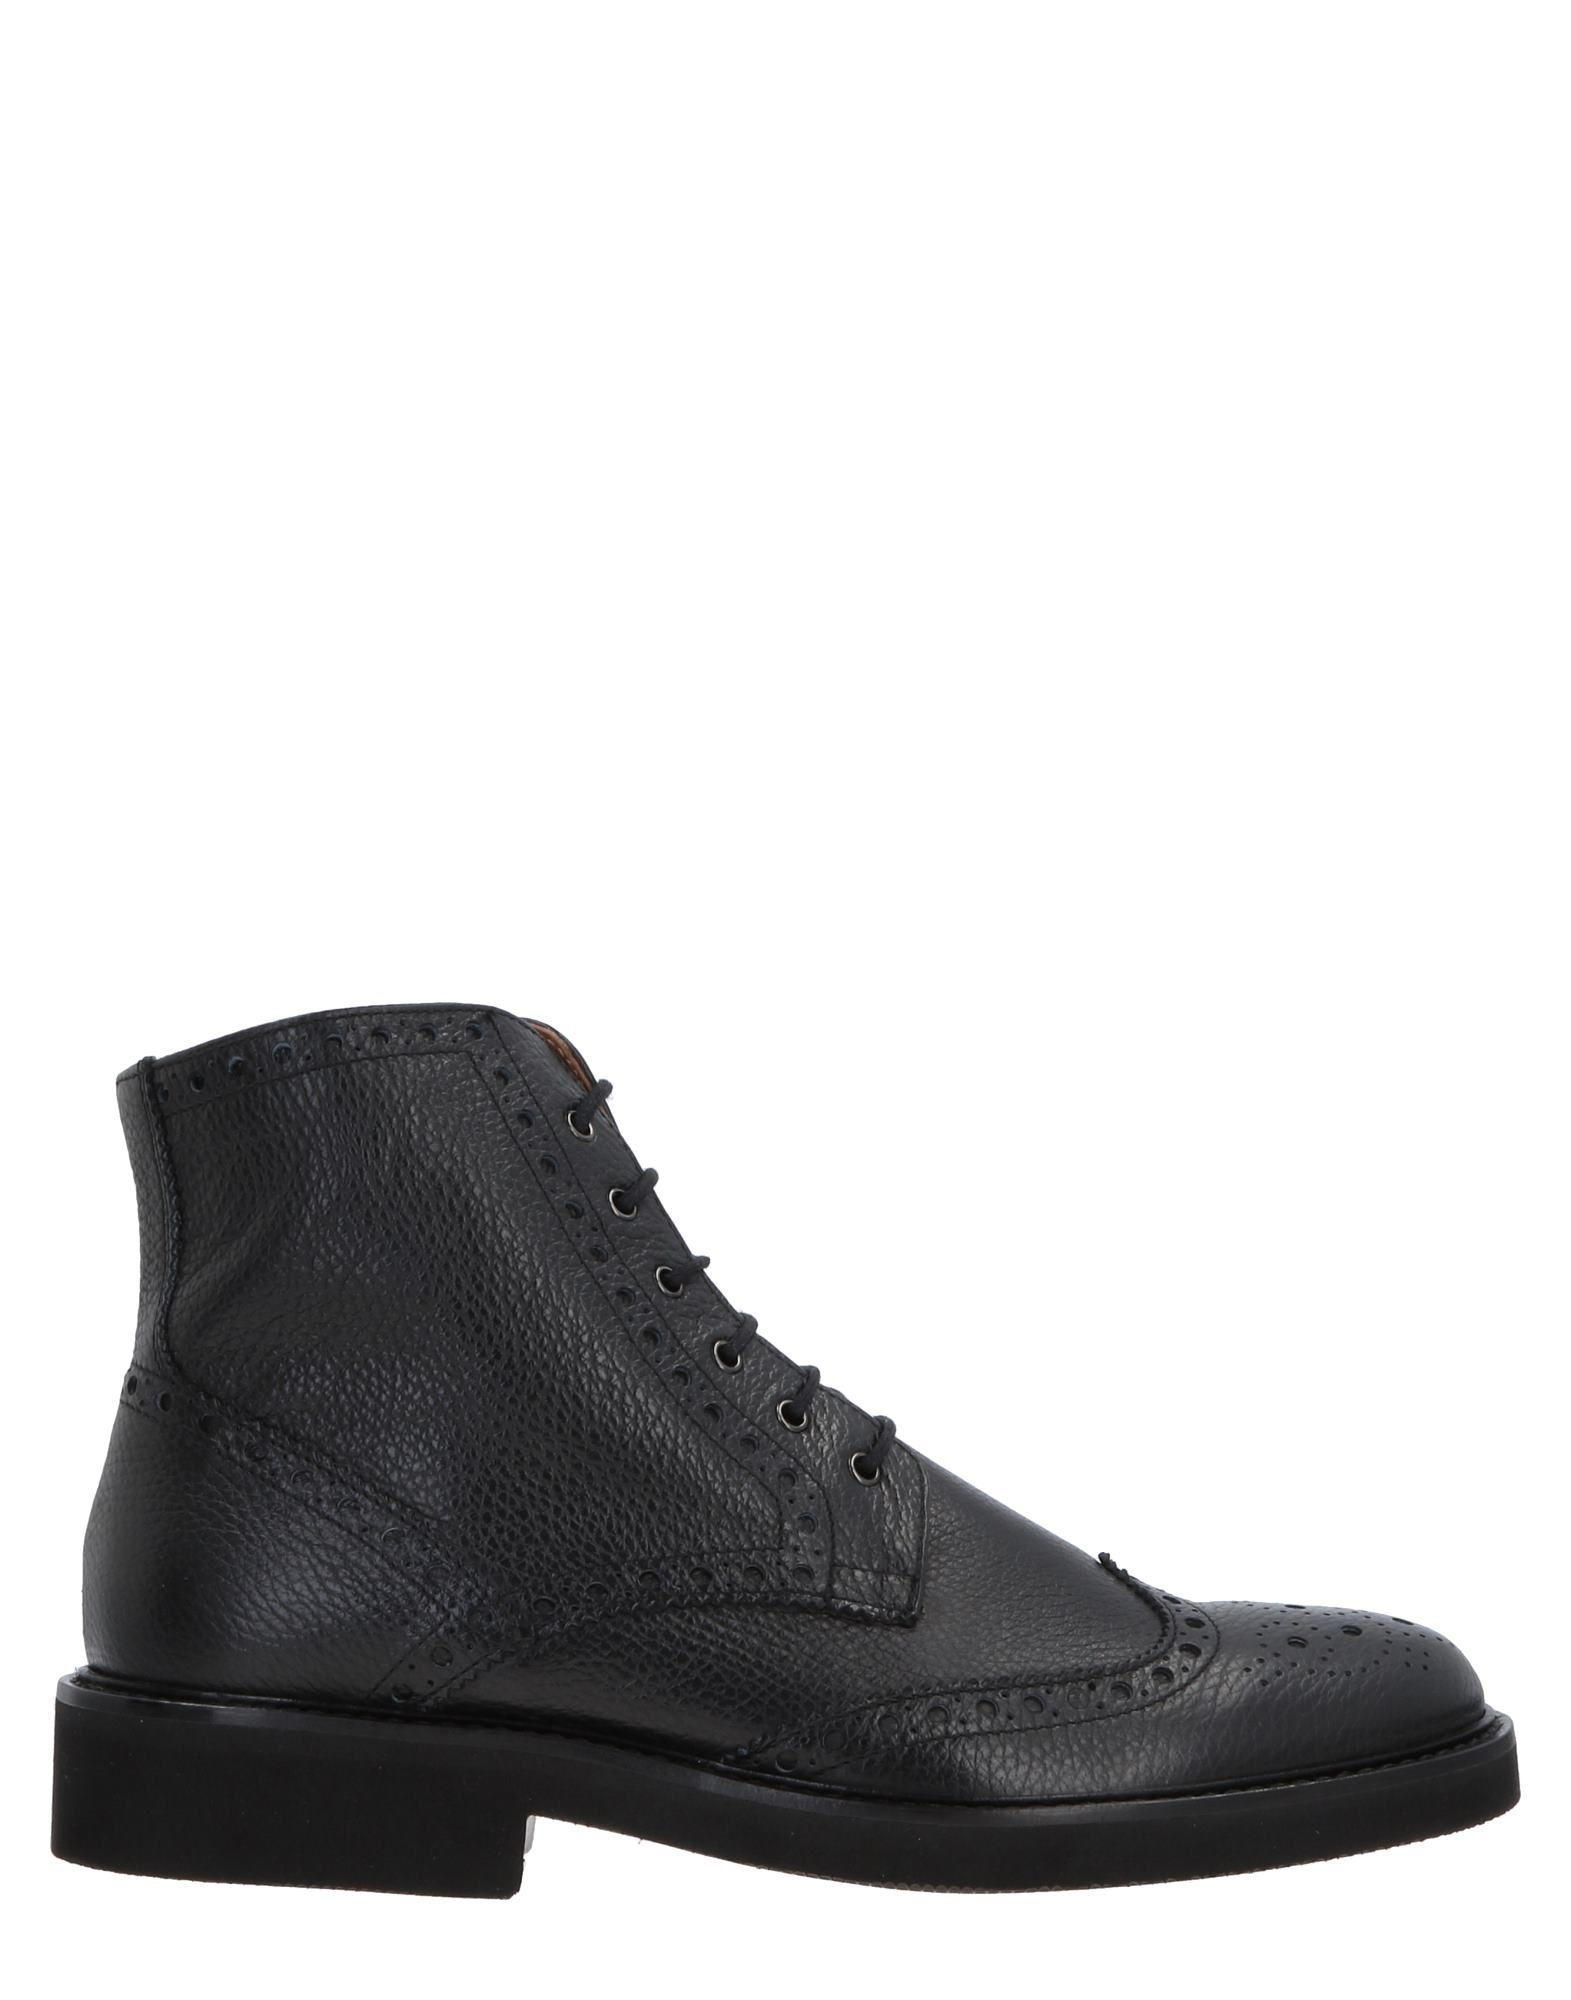 ROBERTO BOTTICELLI Boots in Black